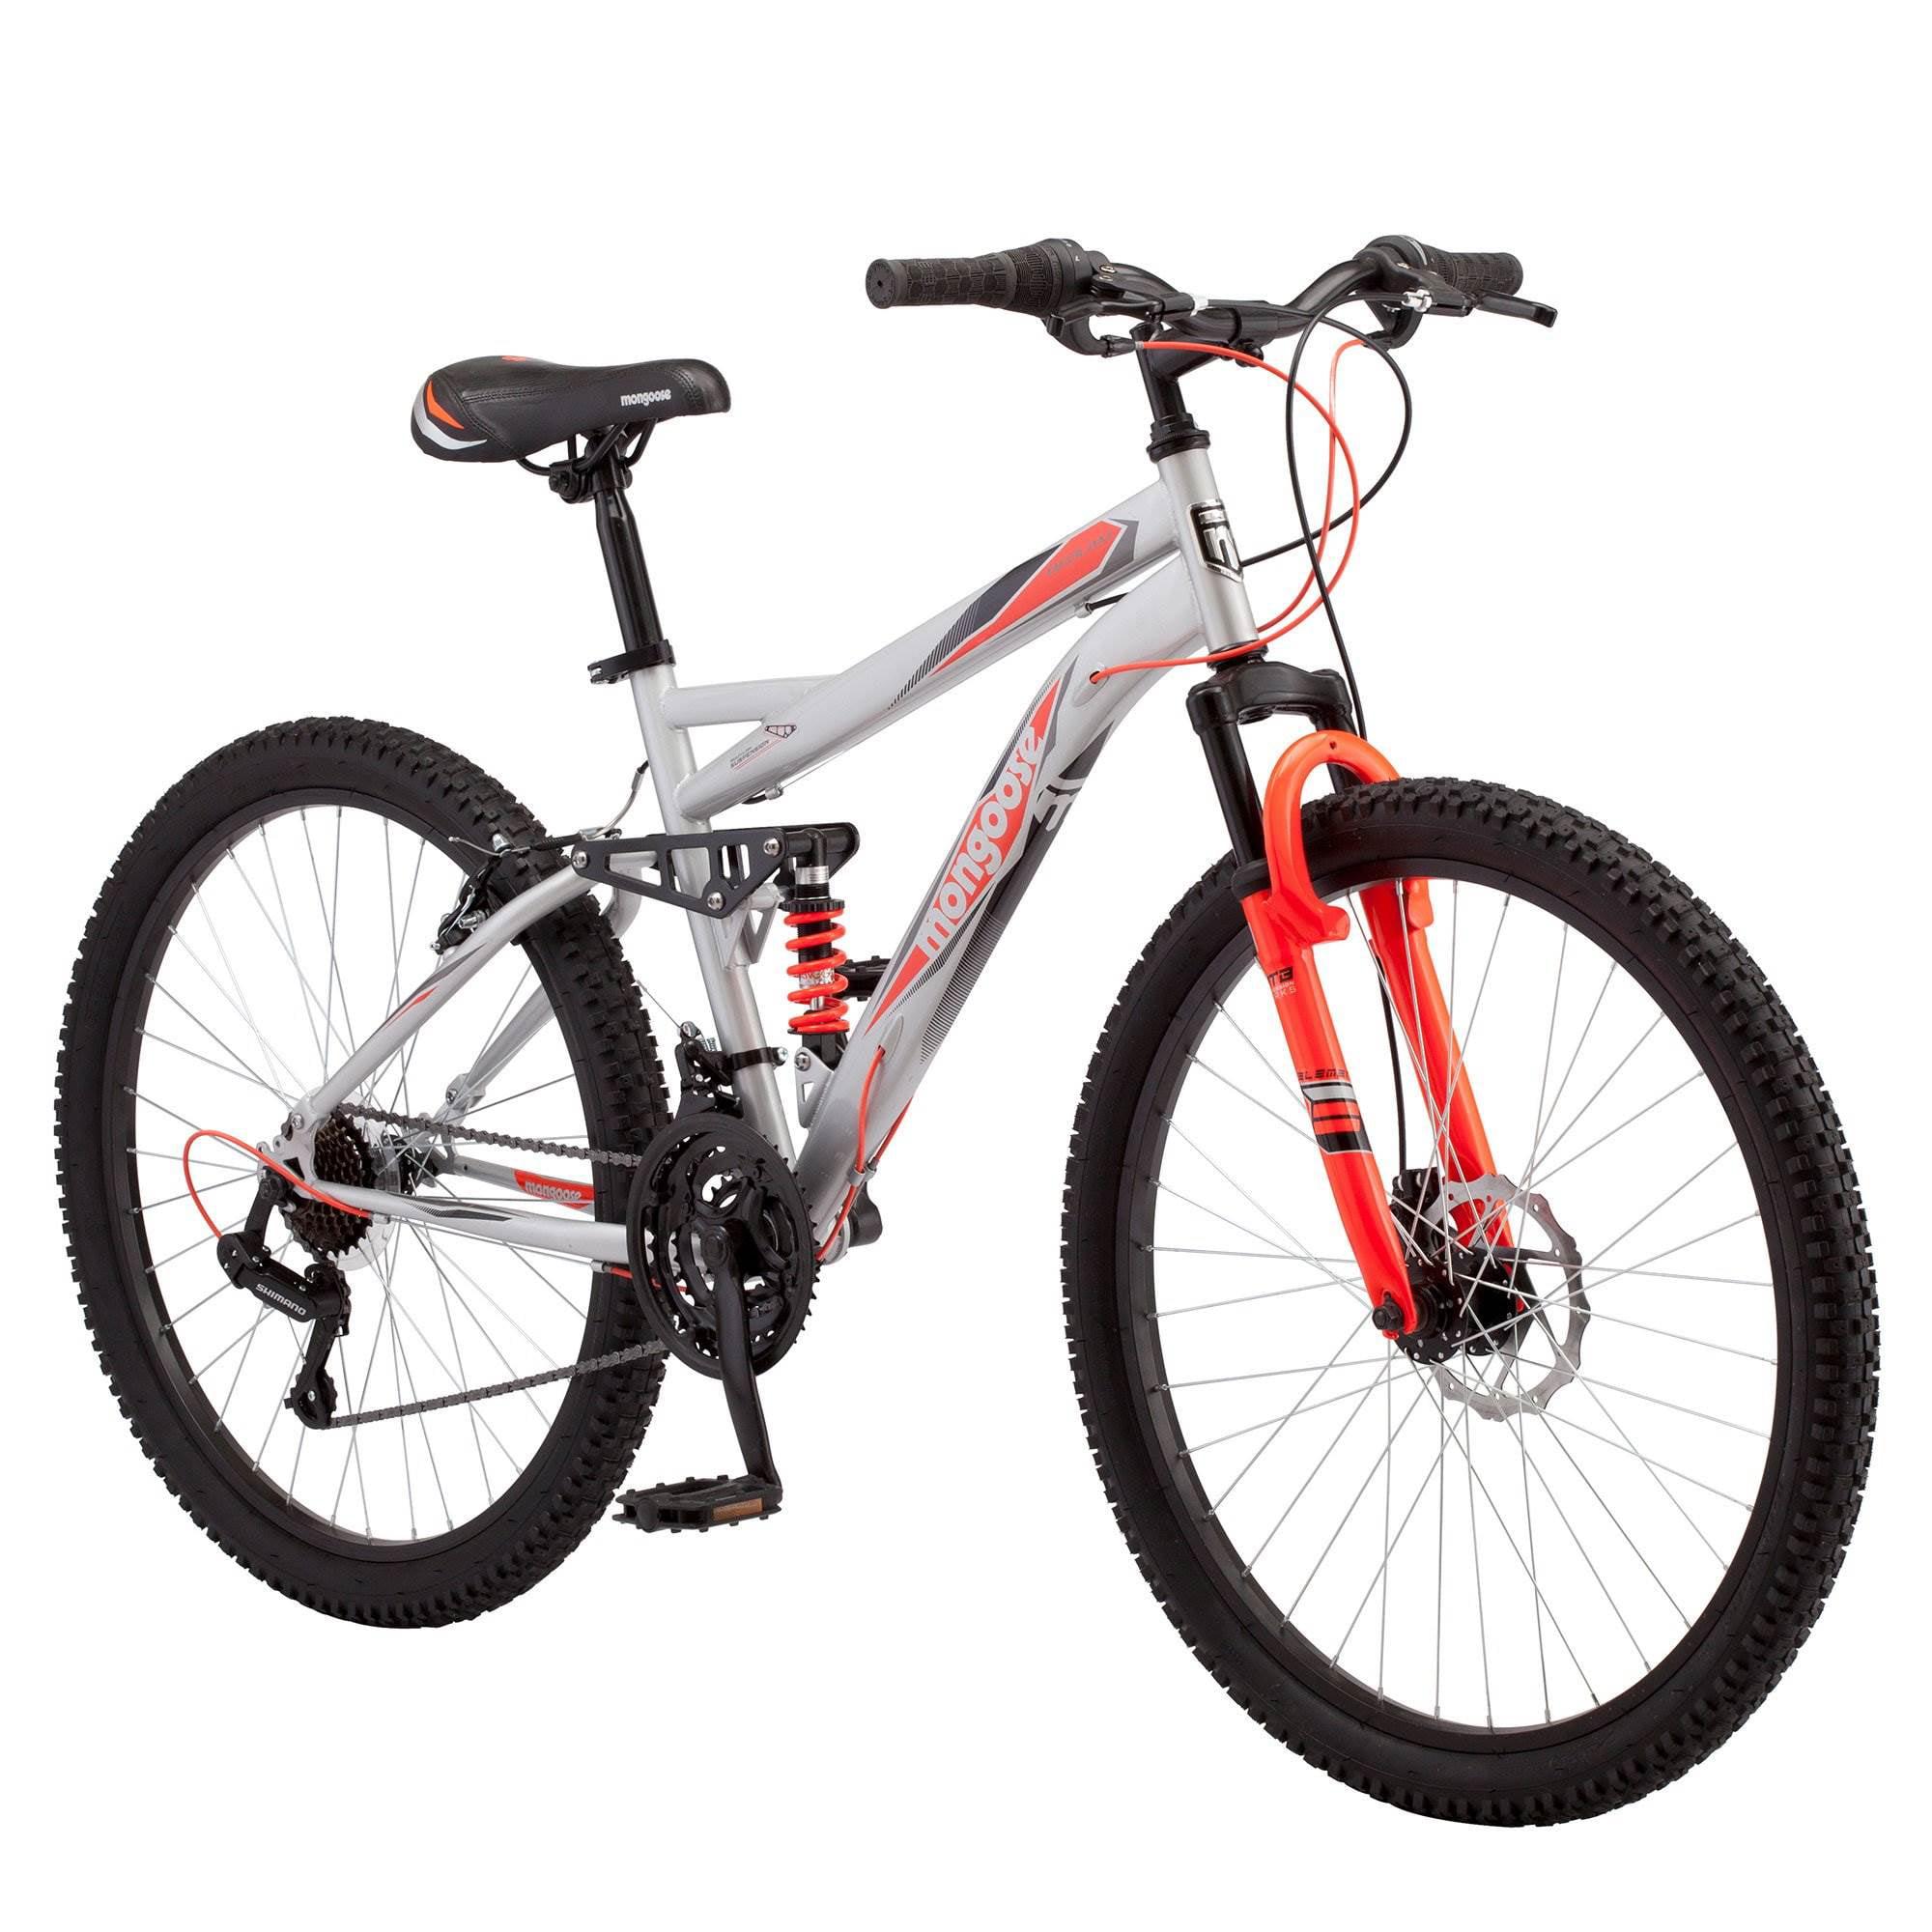 "26/"" NEXT Men Bicycle Bike Full Suspension 21 Speed V Brakes NEW"